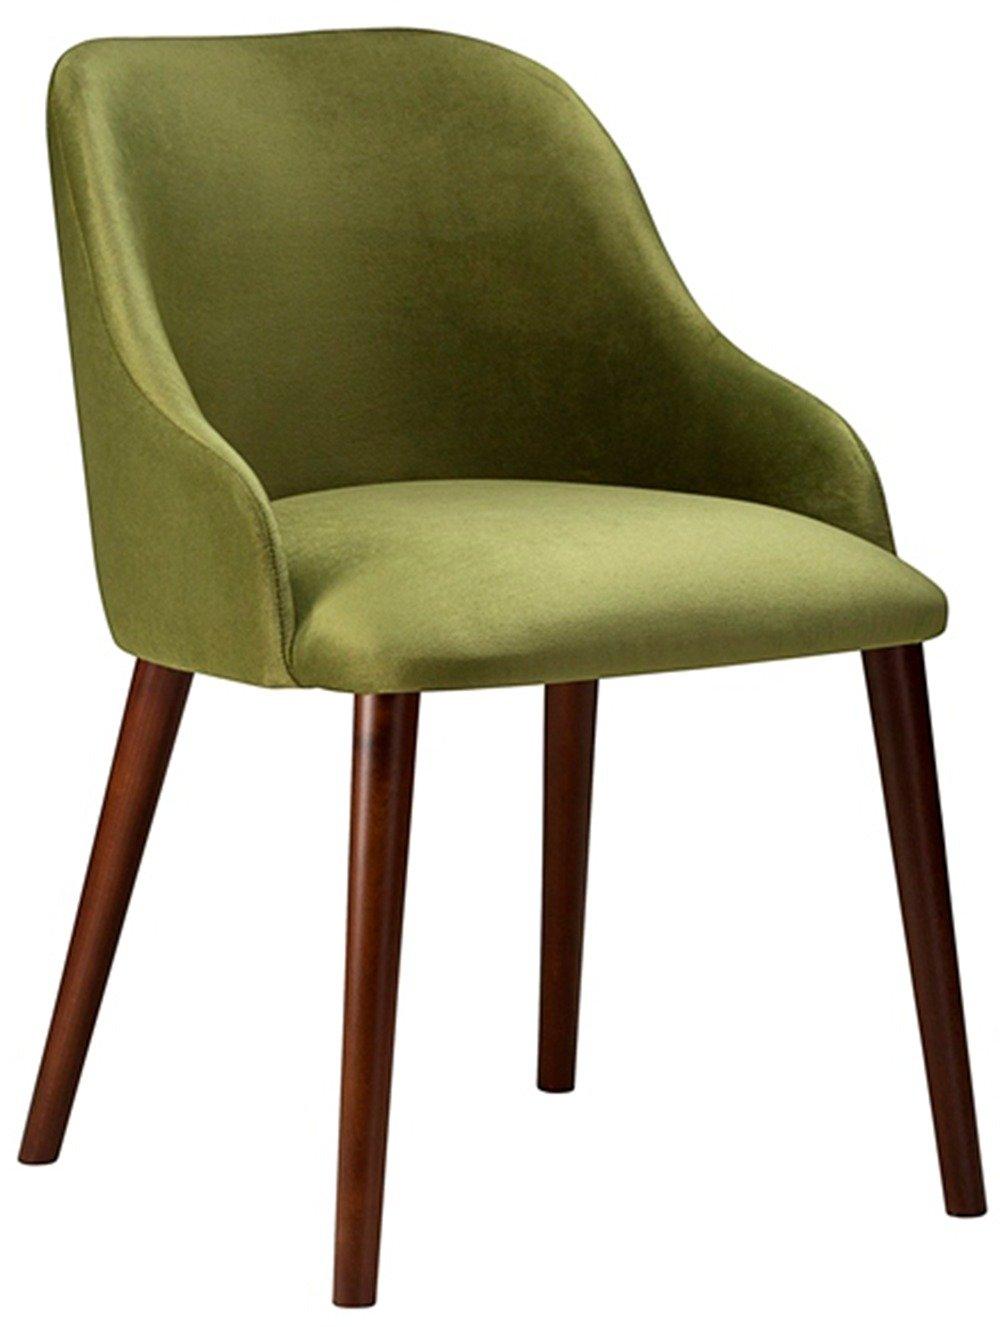 Onyx Arm Chair